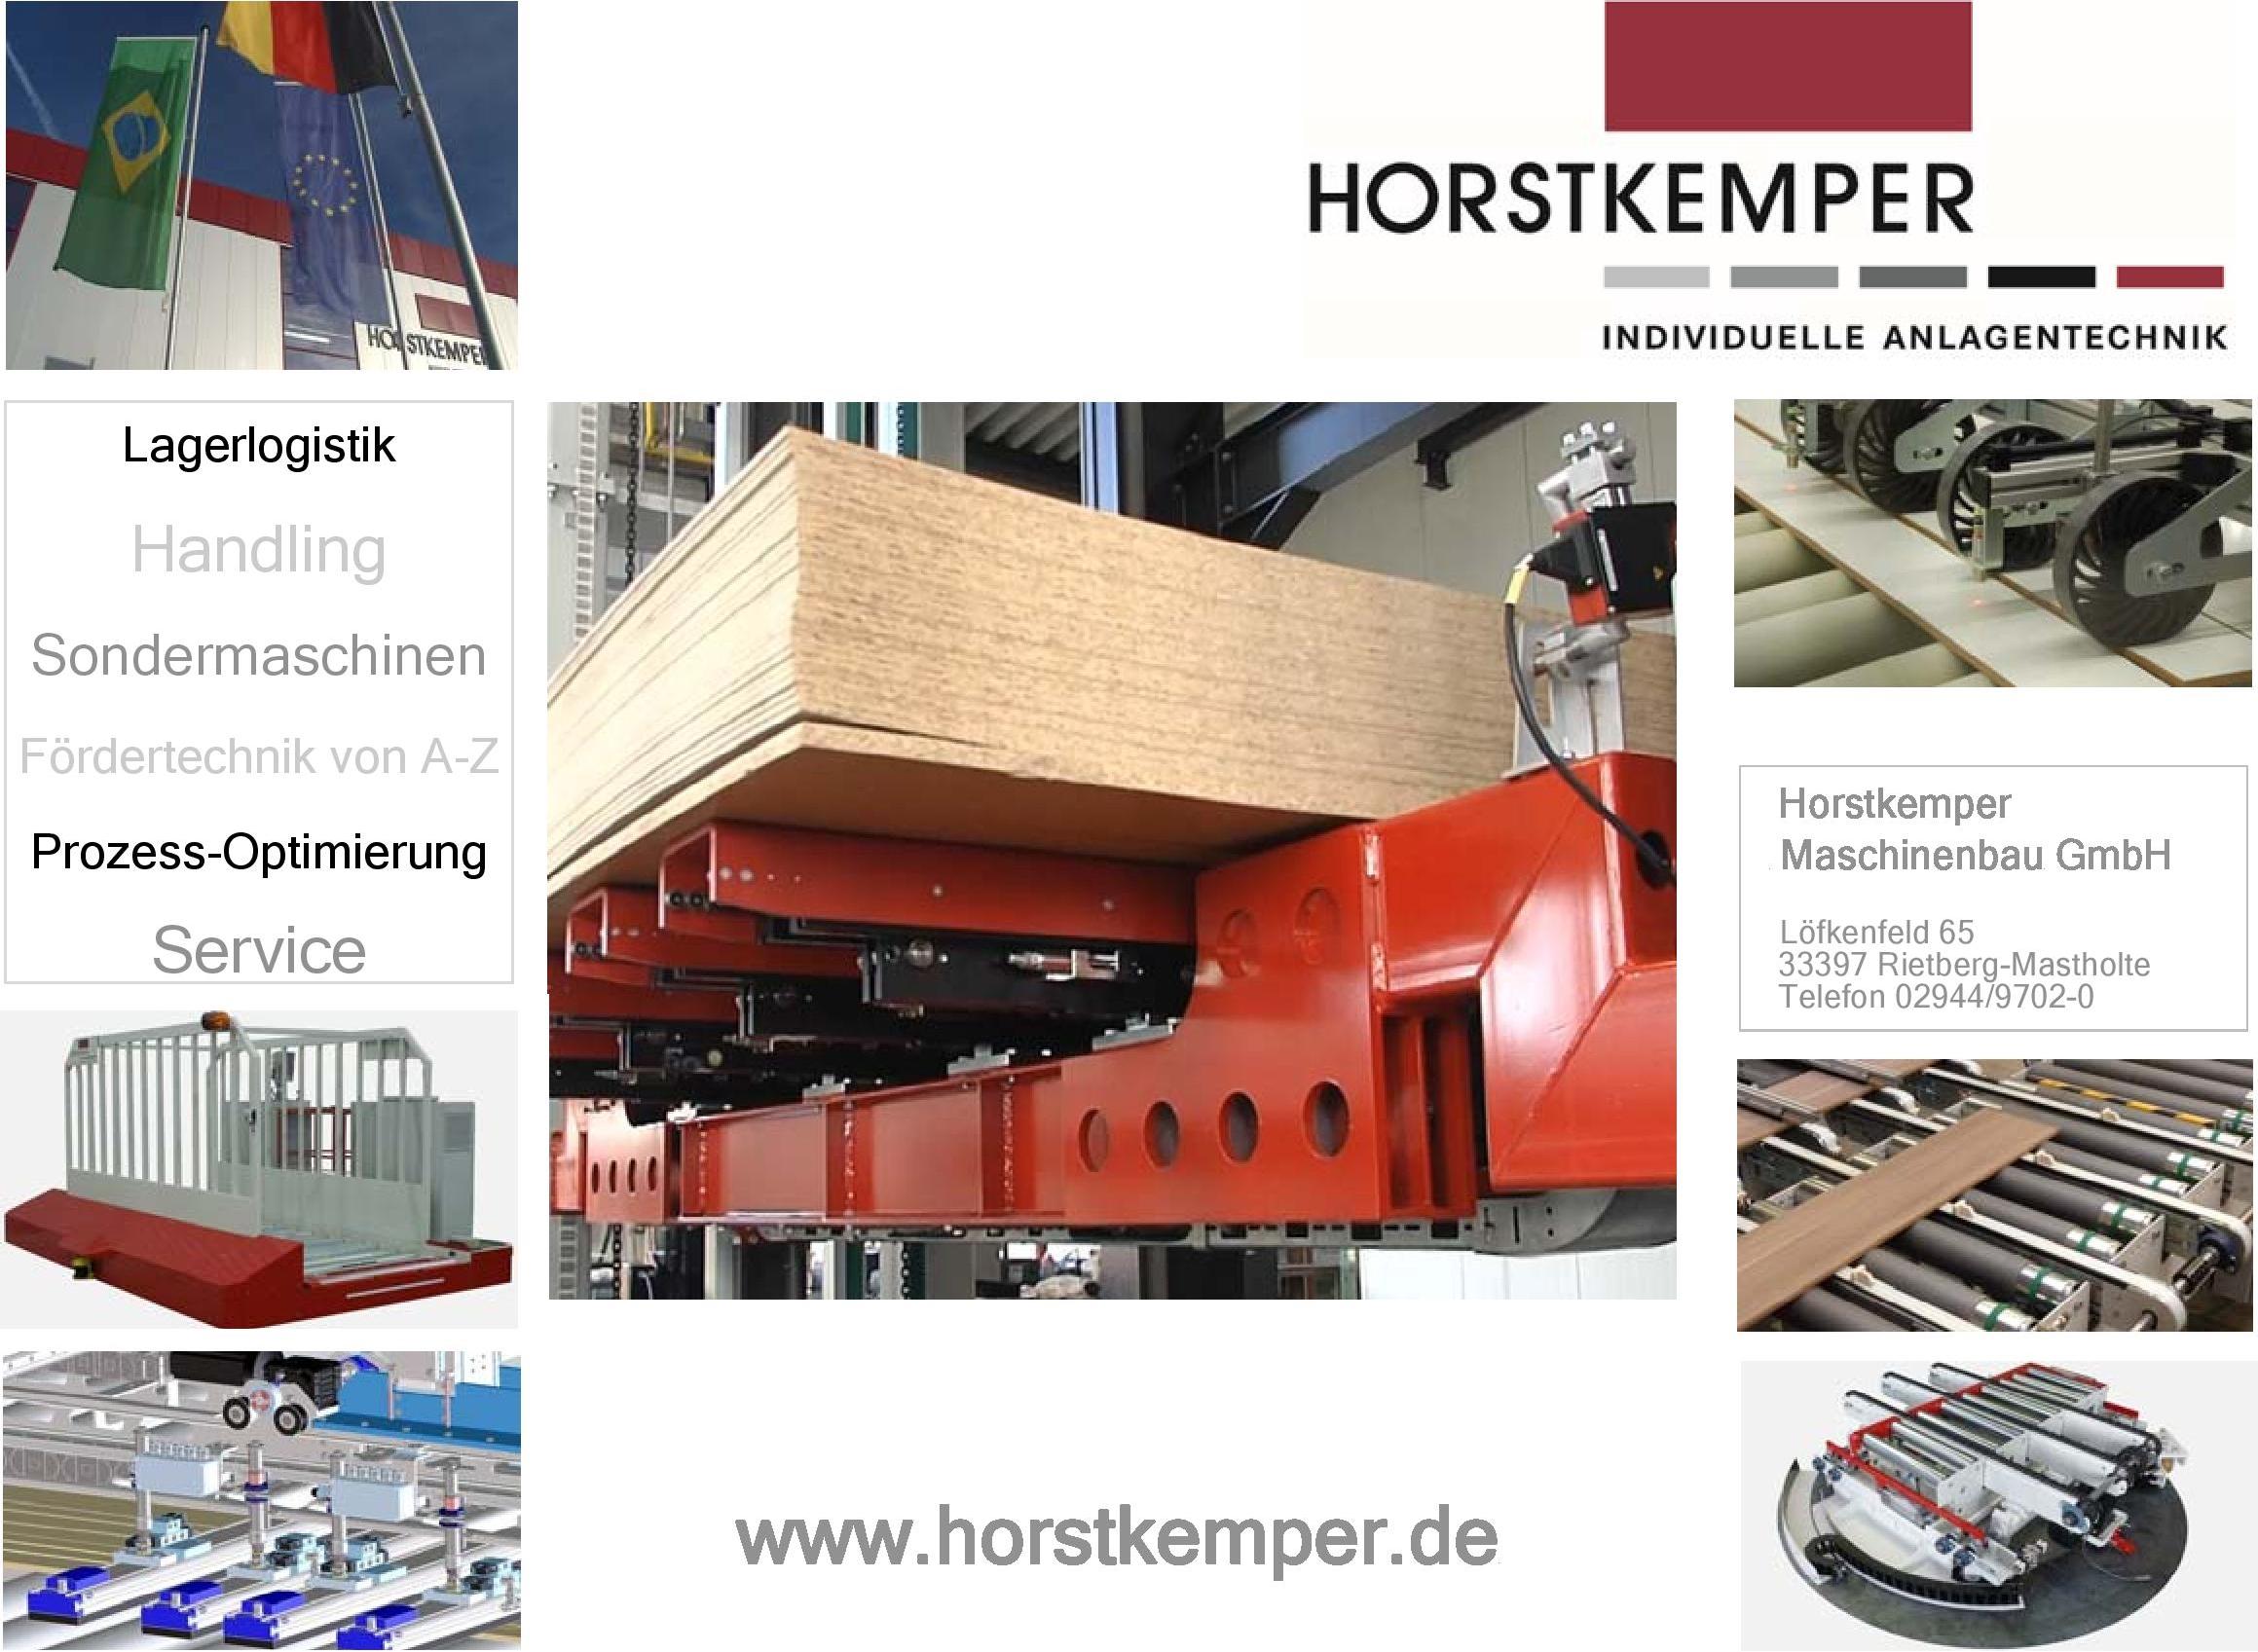 Horstkemper_Anlagentechnik